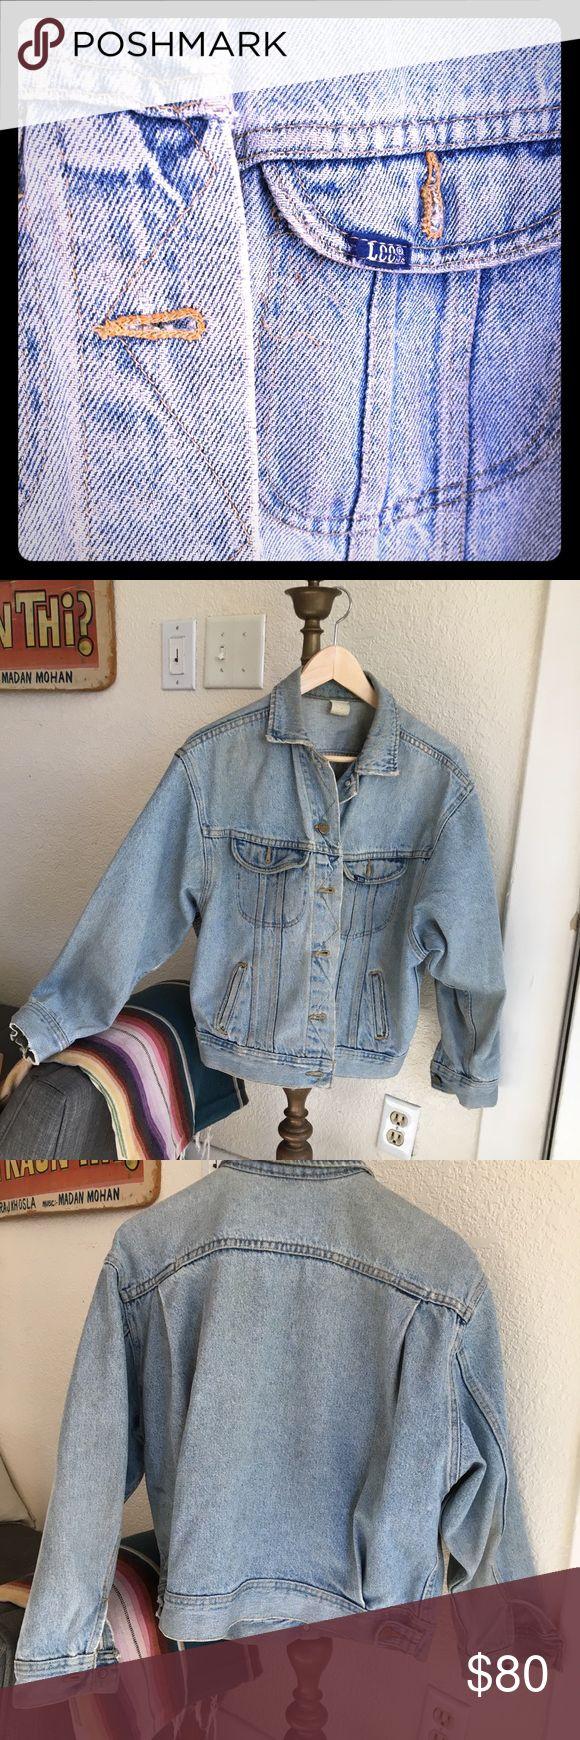 Vintage 1980's Lee Denim Jacket Classic acid wash denim jacket featuring 80's style dolman sleeves. Lee Jackets & Coats Jean Jackets